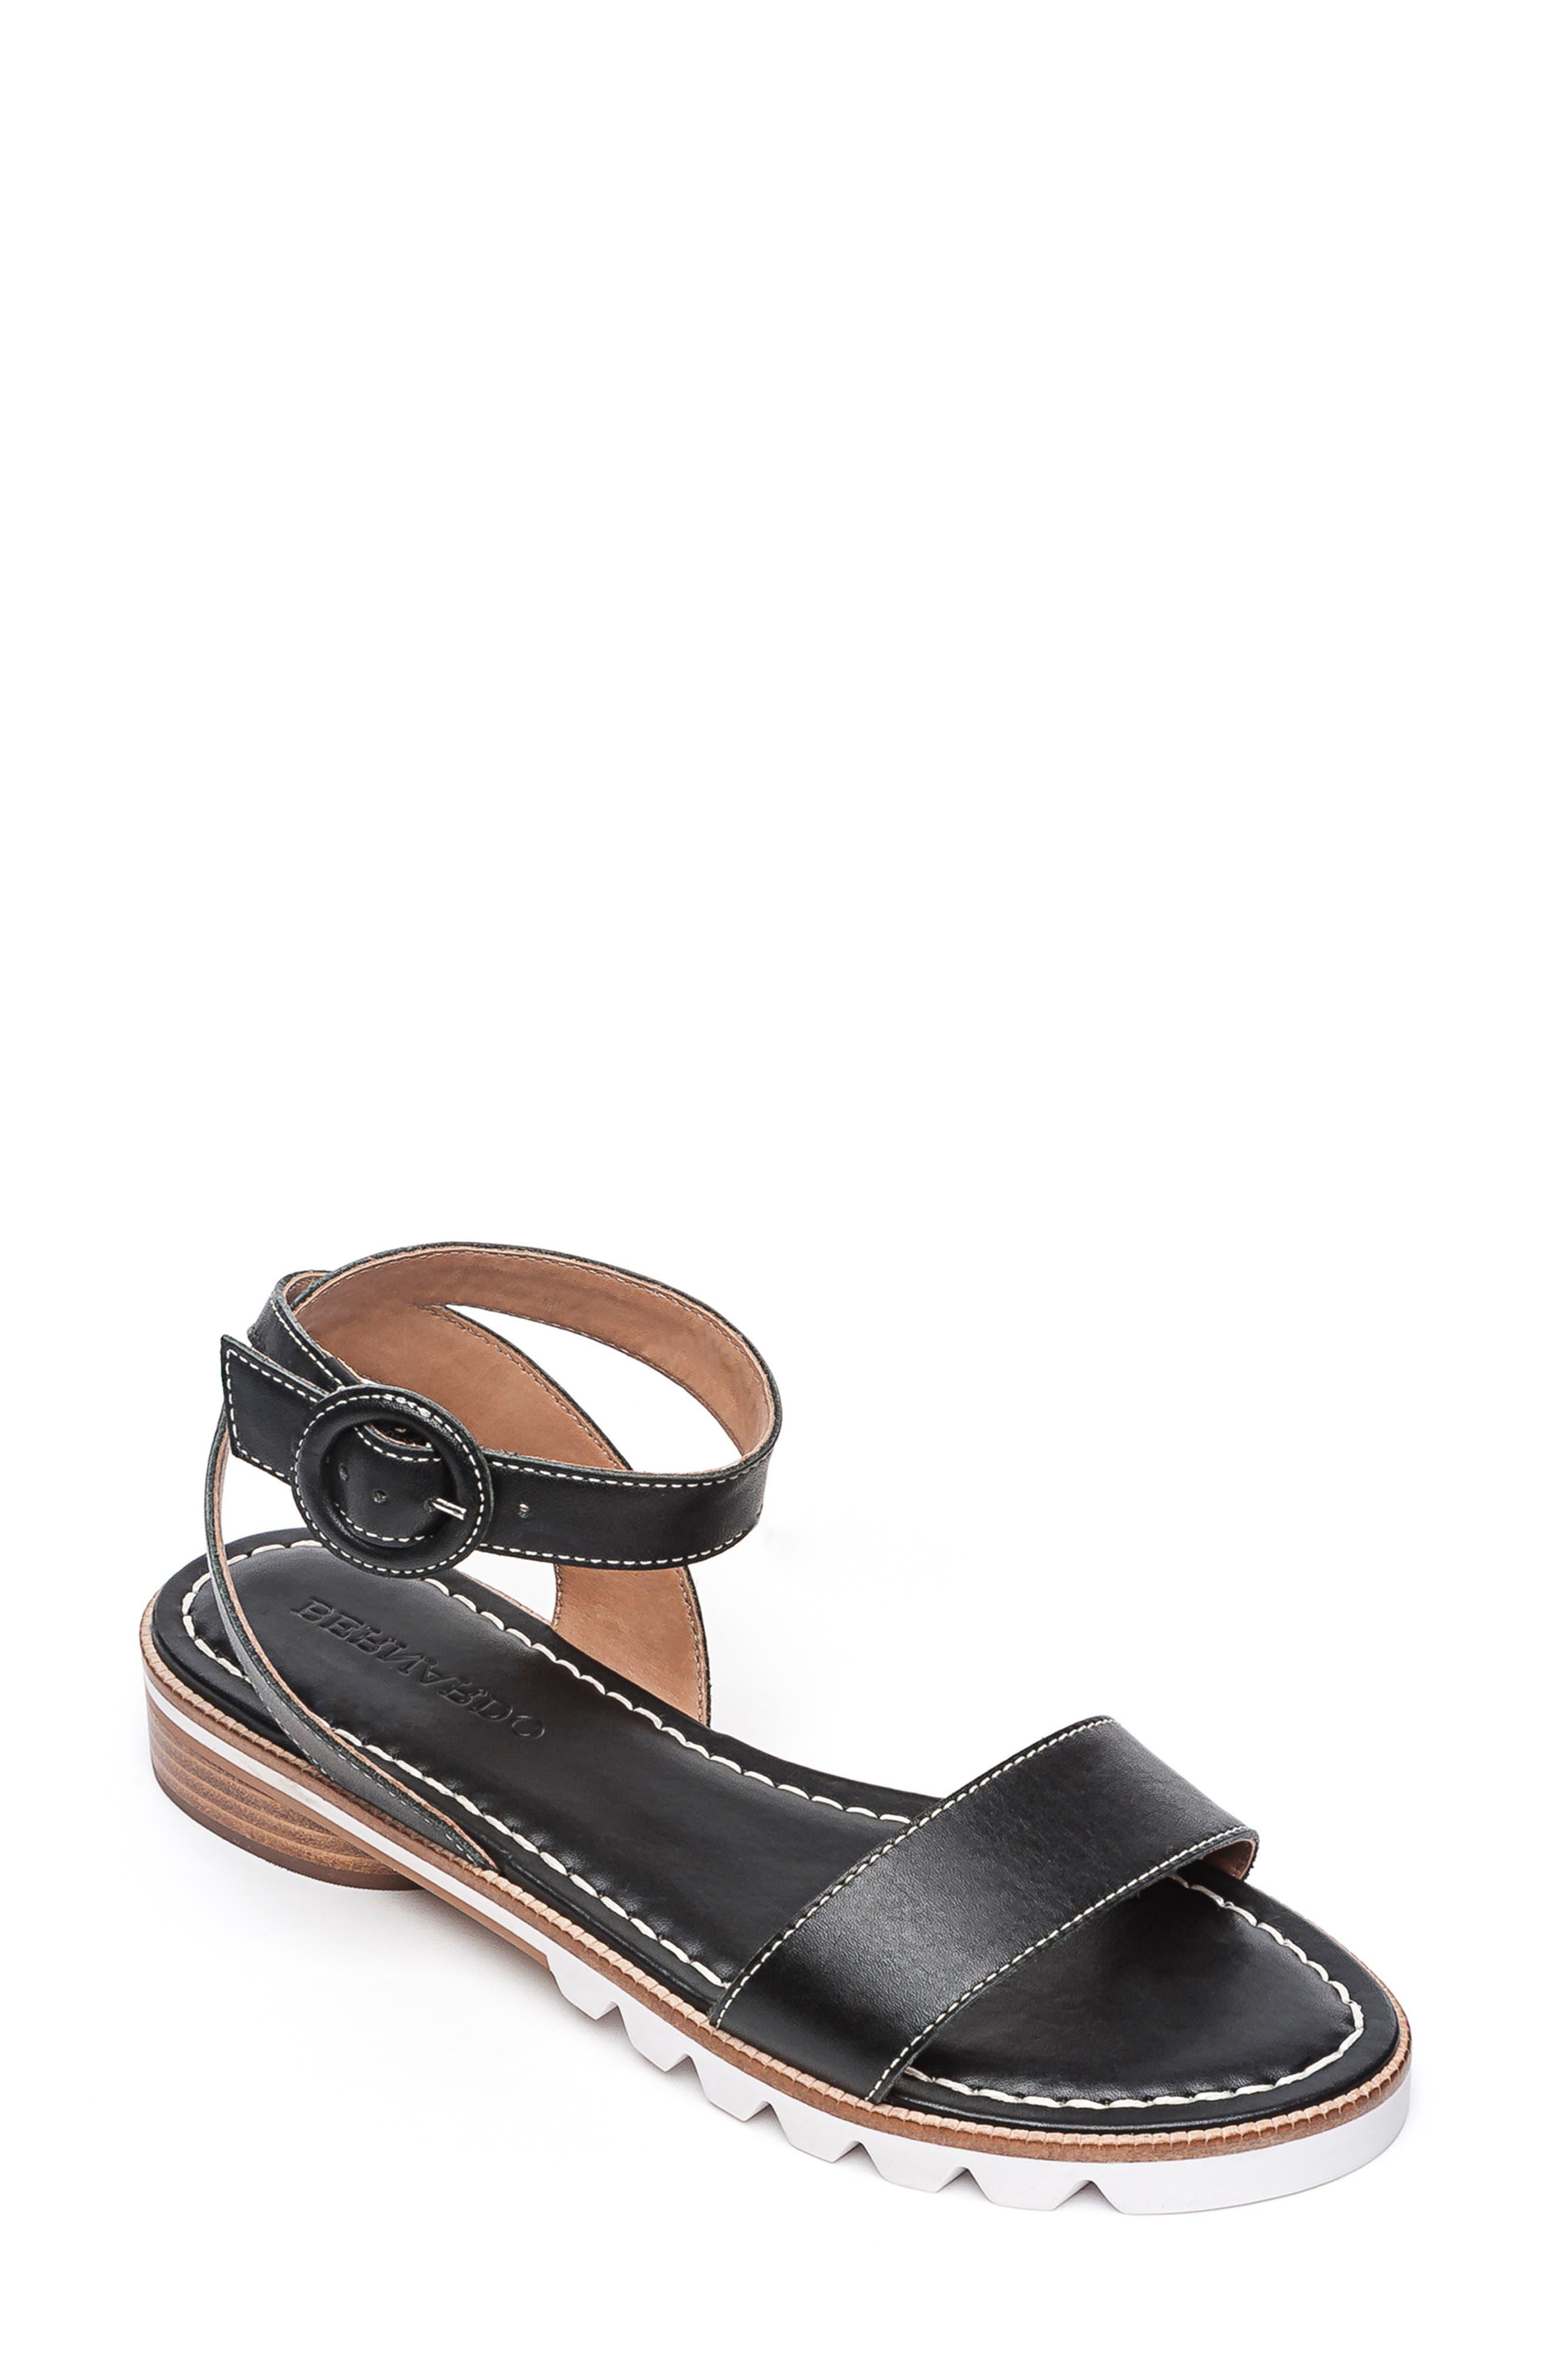 BERNARDO Footwear Alexis Ankle Strap Sandal, Main, color, BLACK